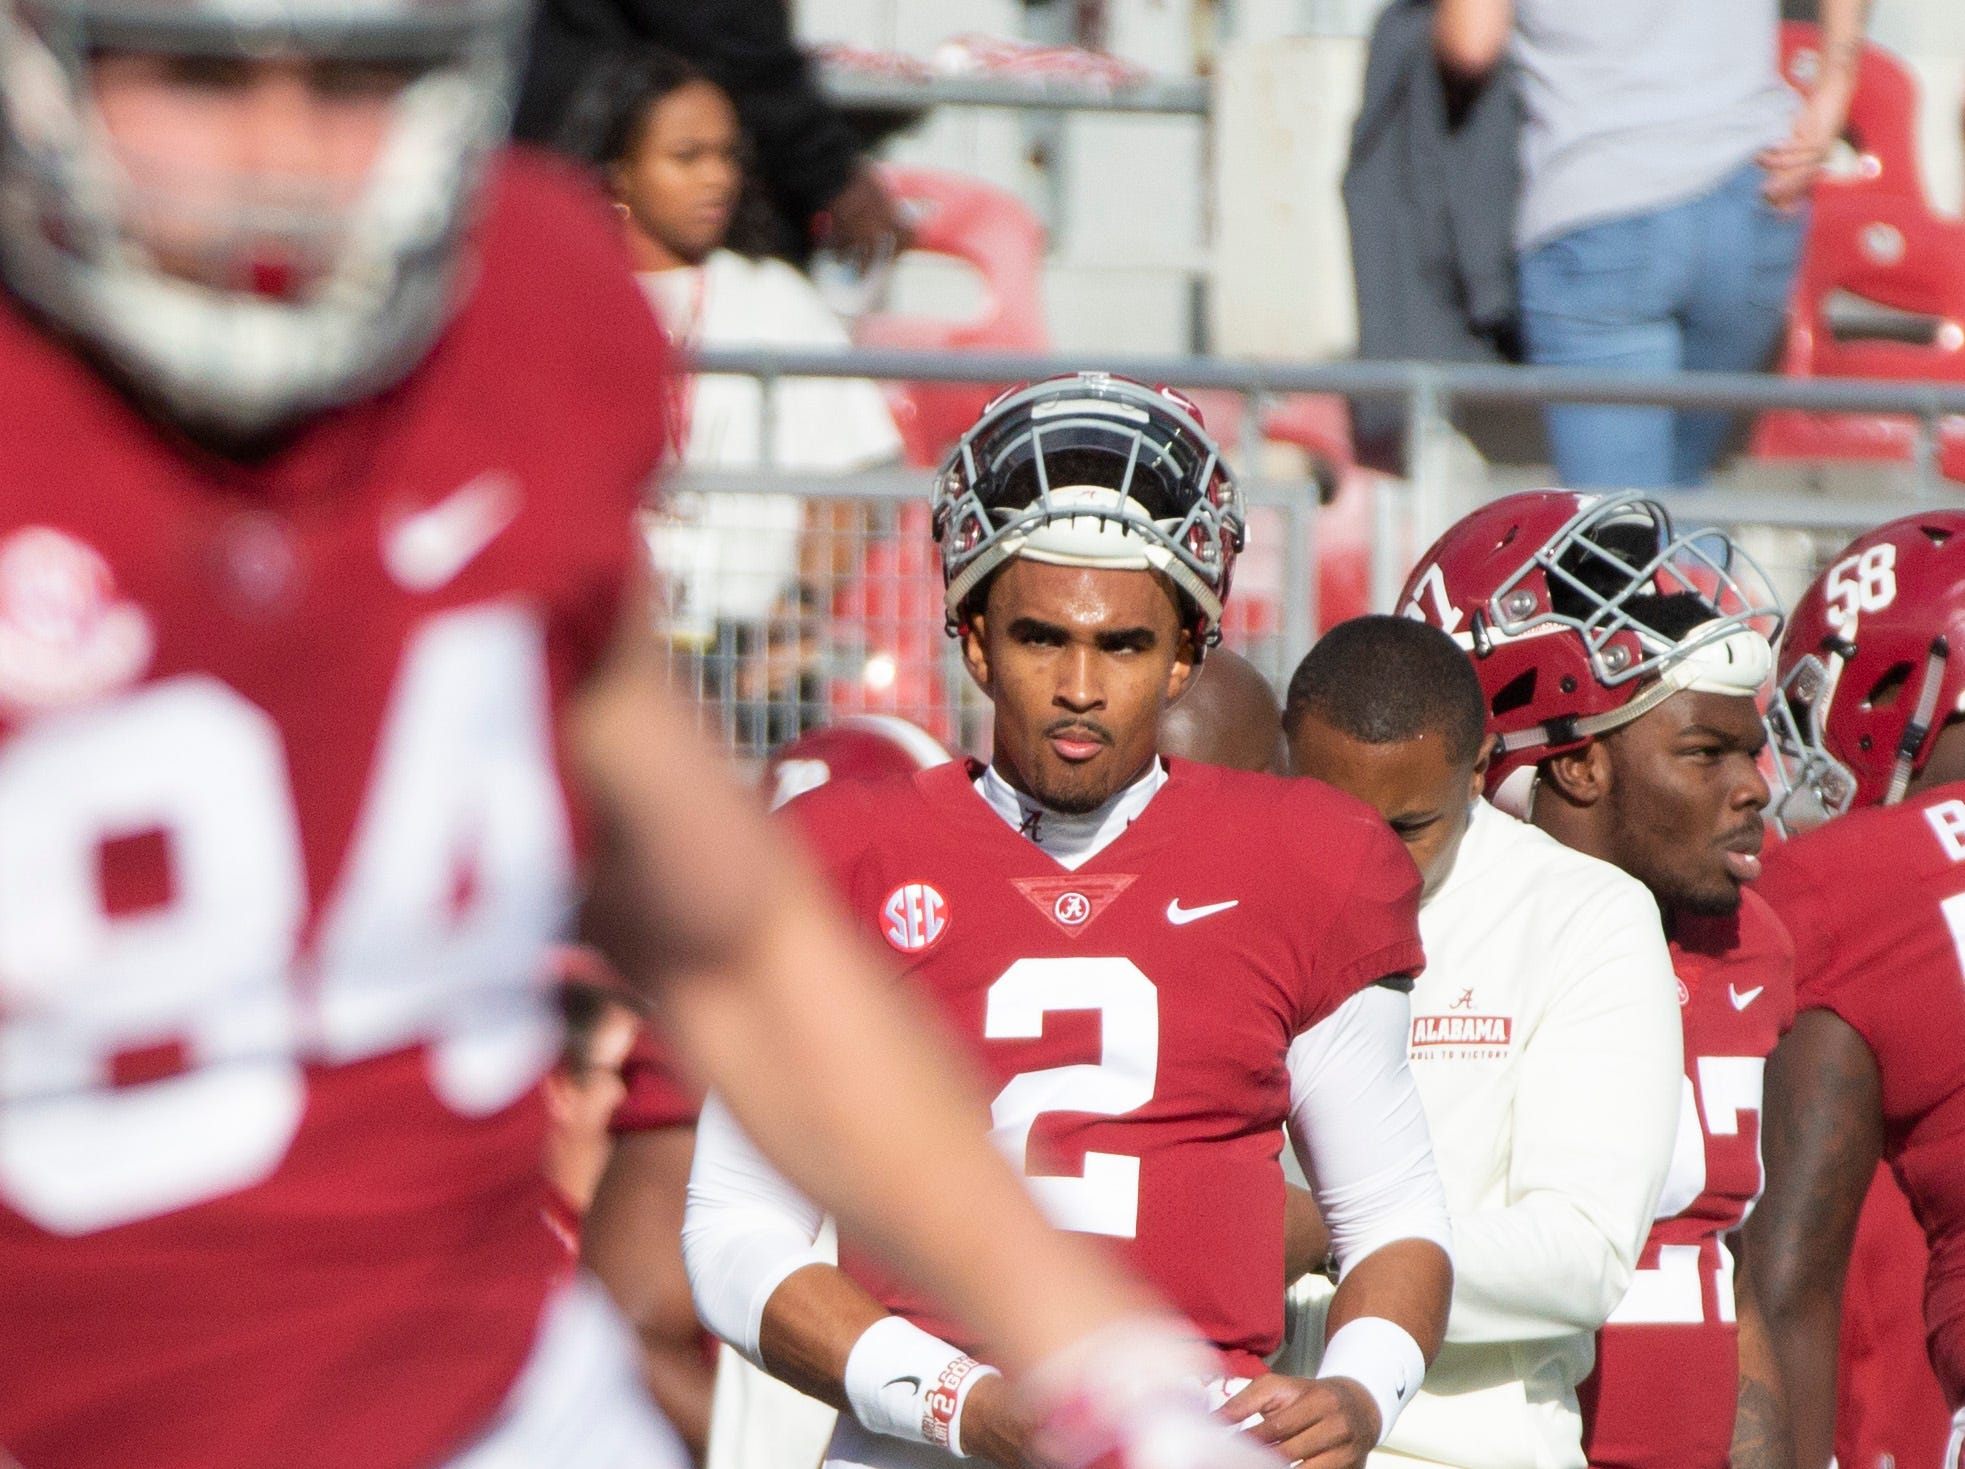 Alabama's Jalen Hurts looks on during practice drills.